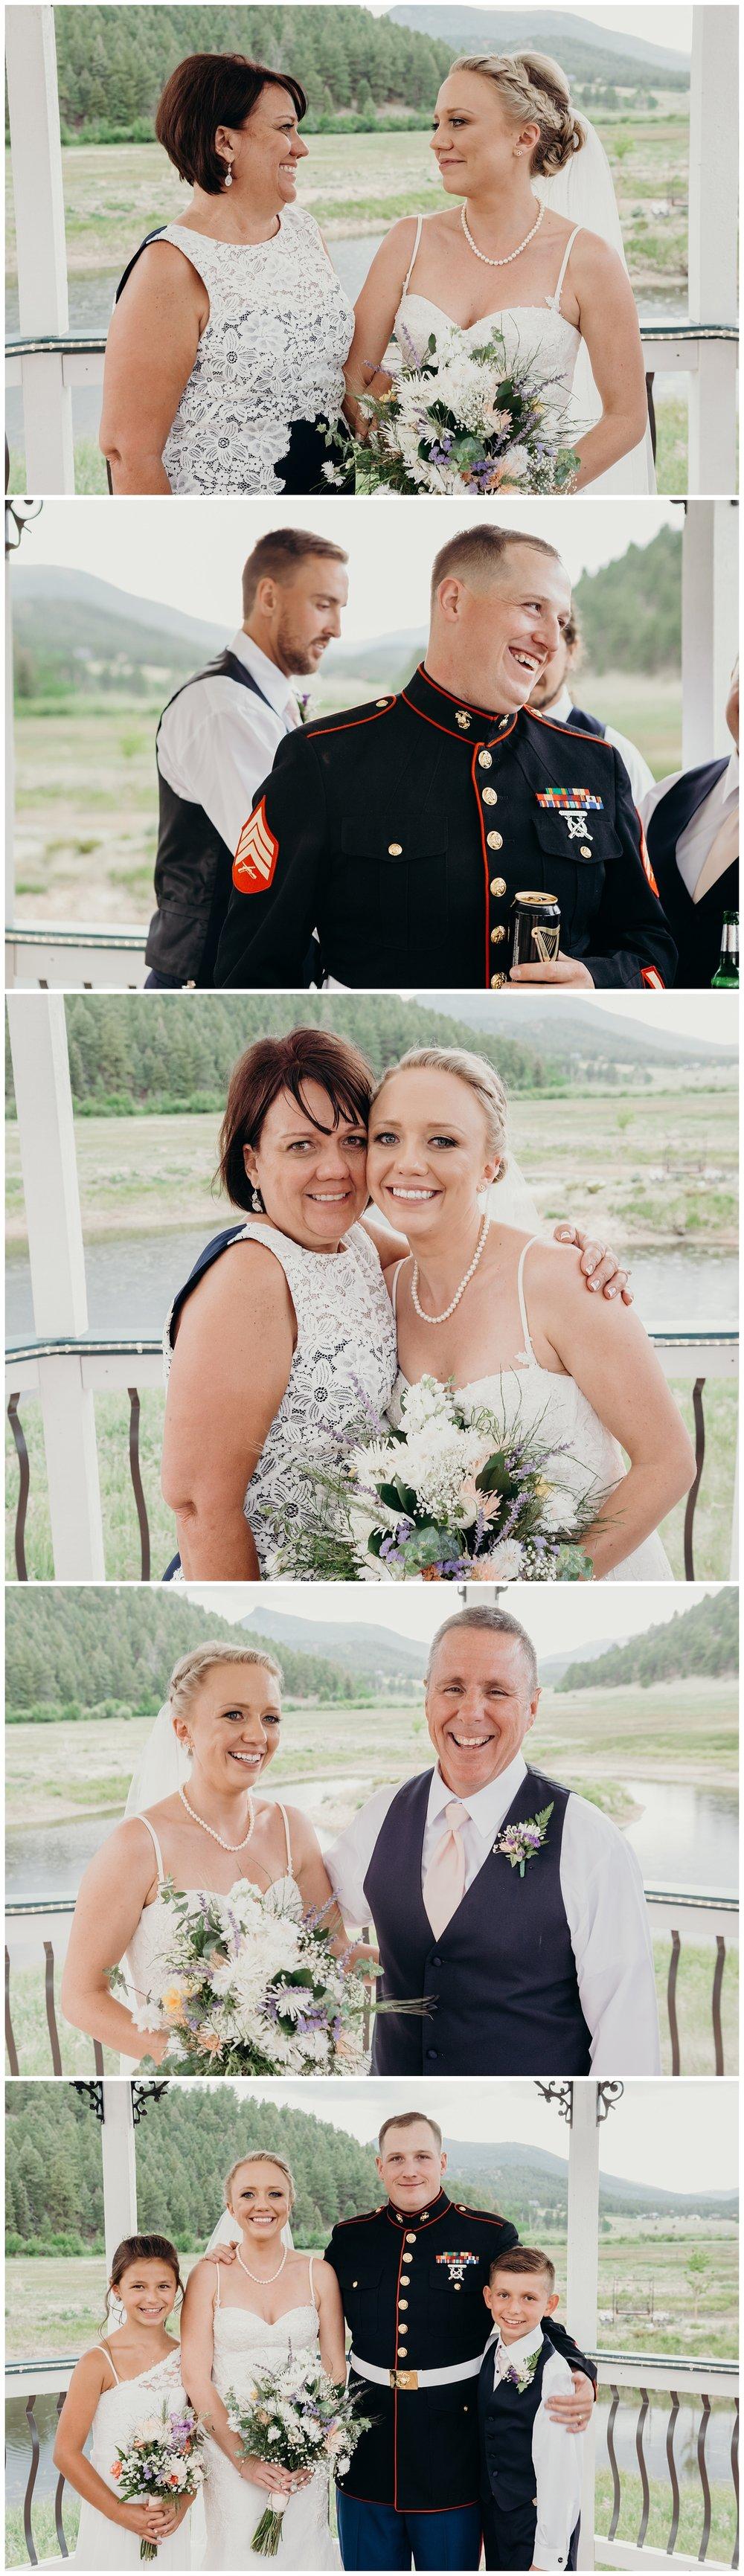 deer-creek-valley-ranch-wedding-photos_0077.jpg